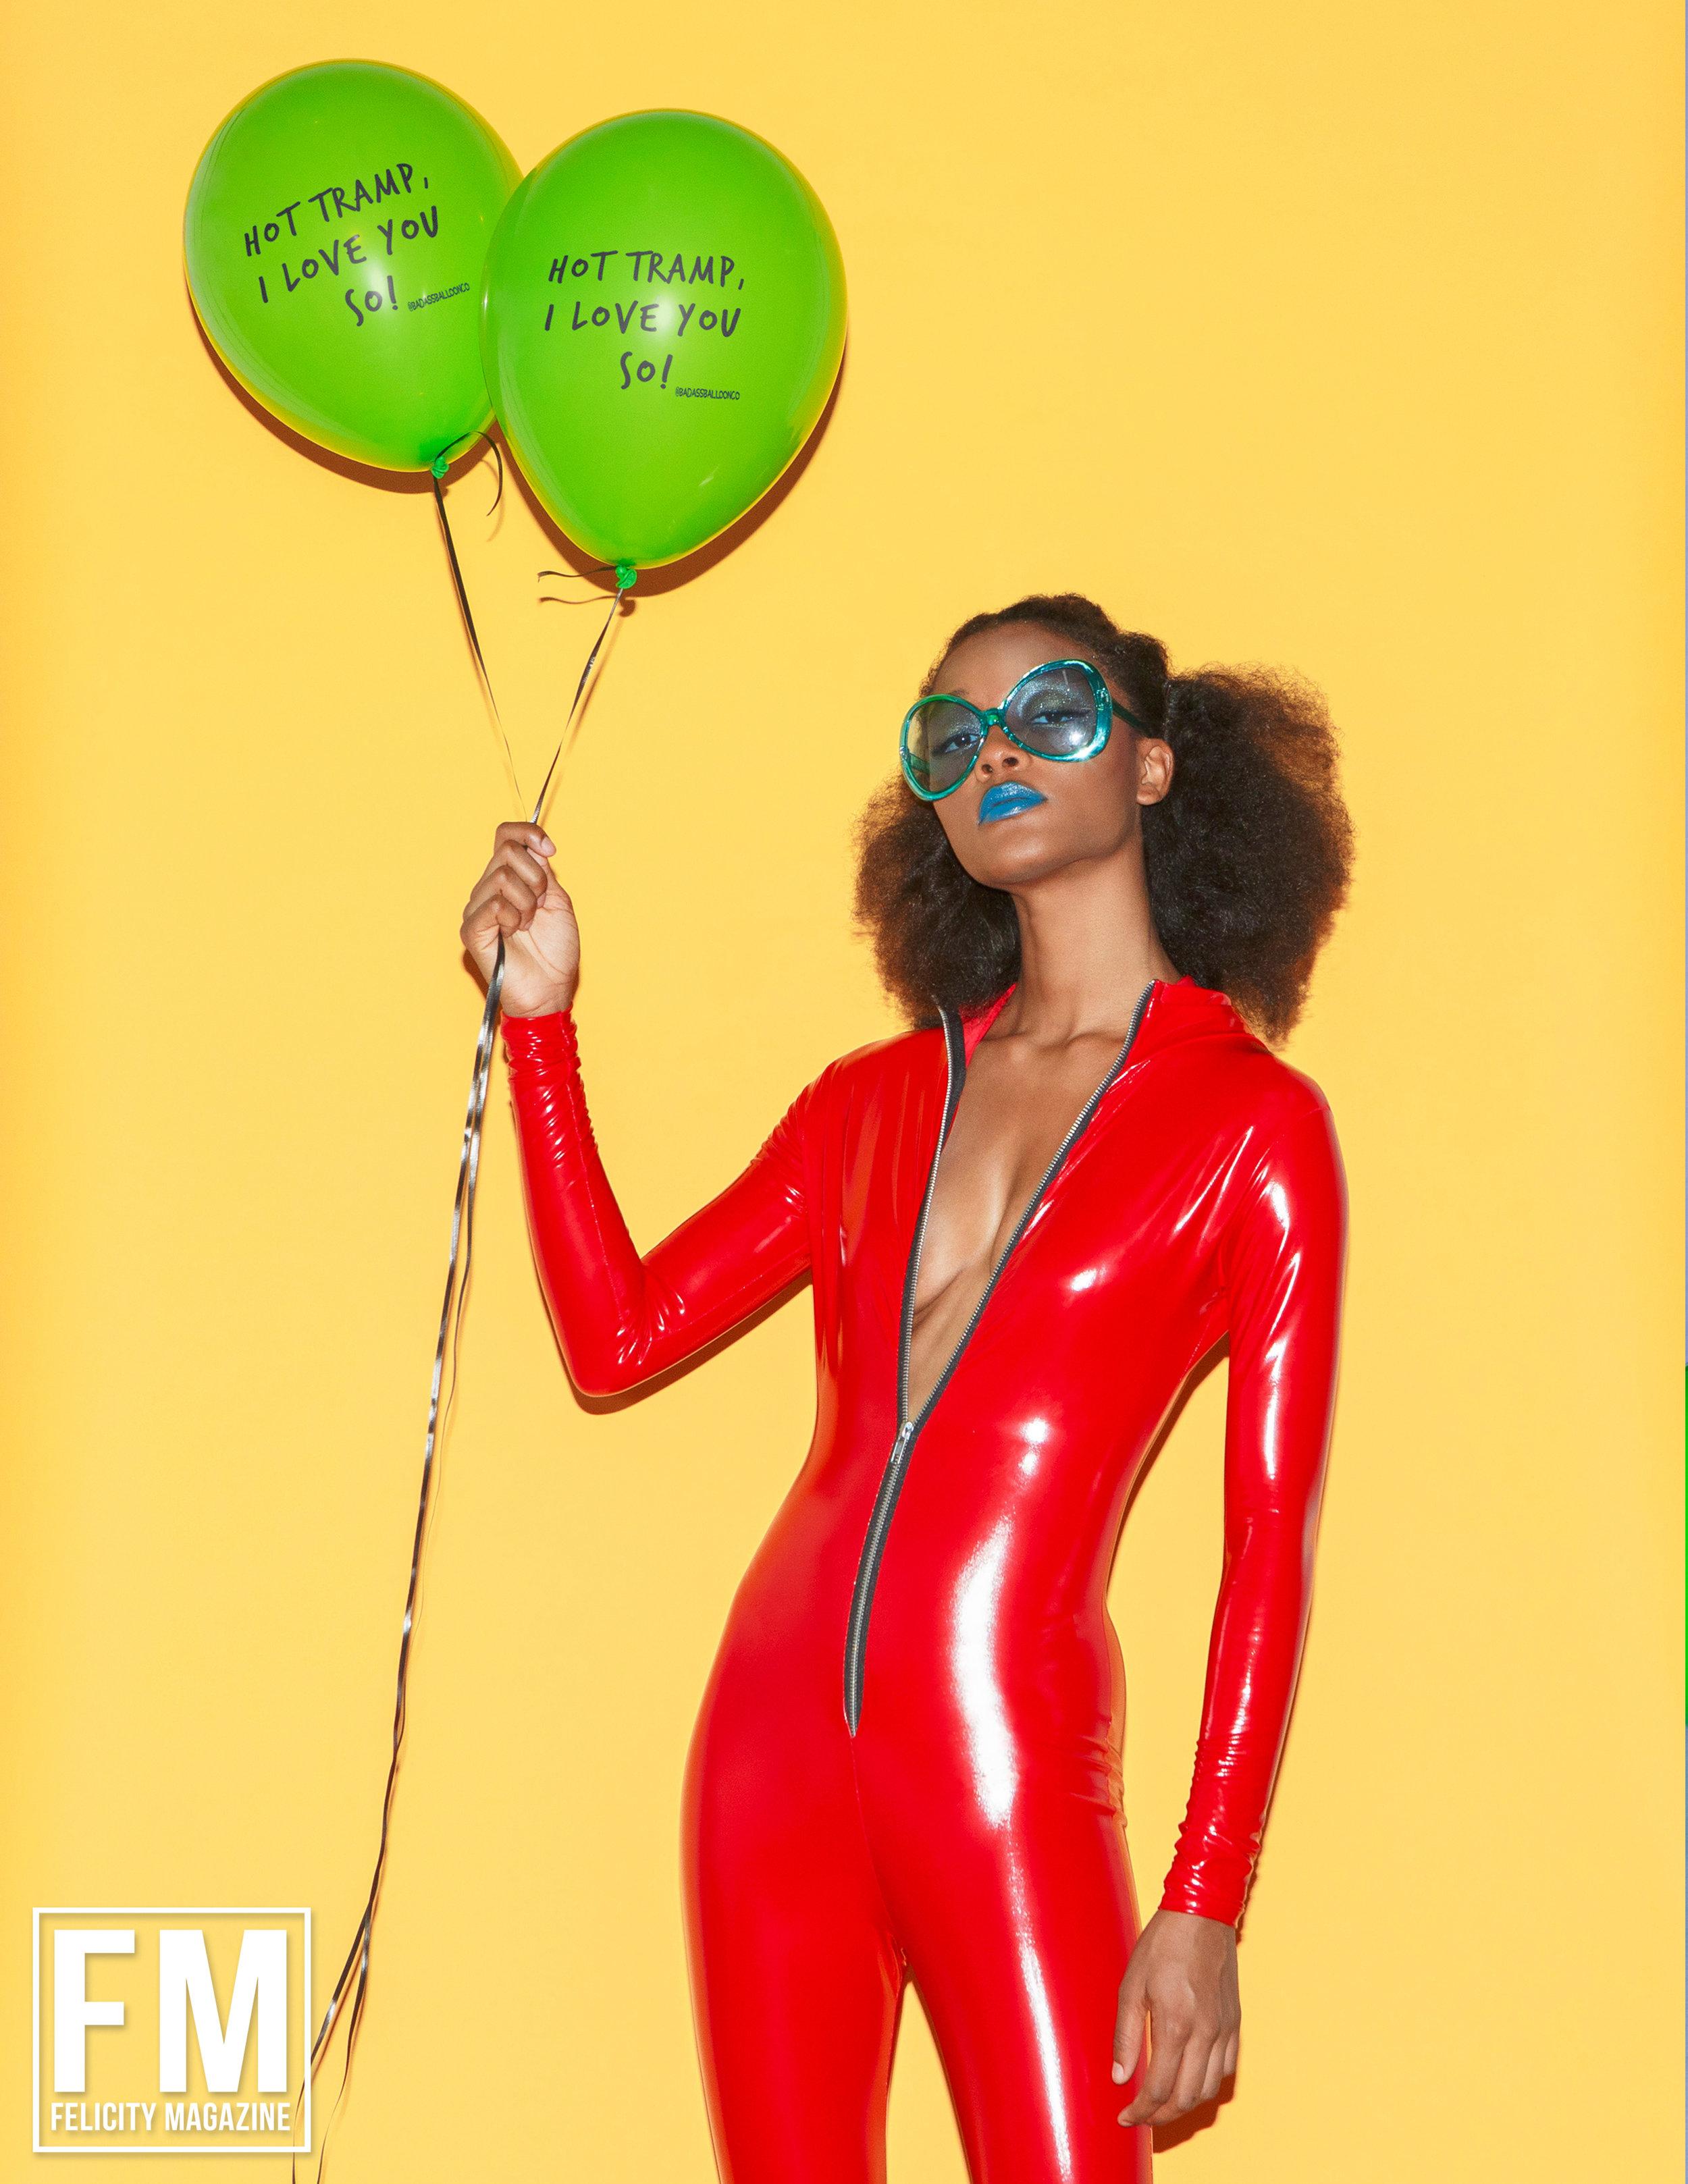 FM Badass Balloon - Jalisa 2.jpg